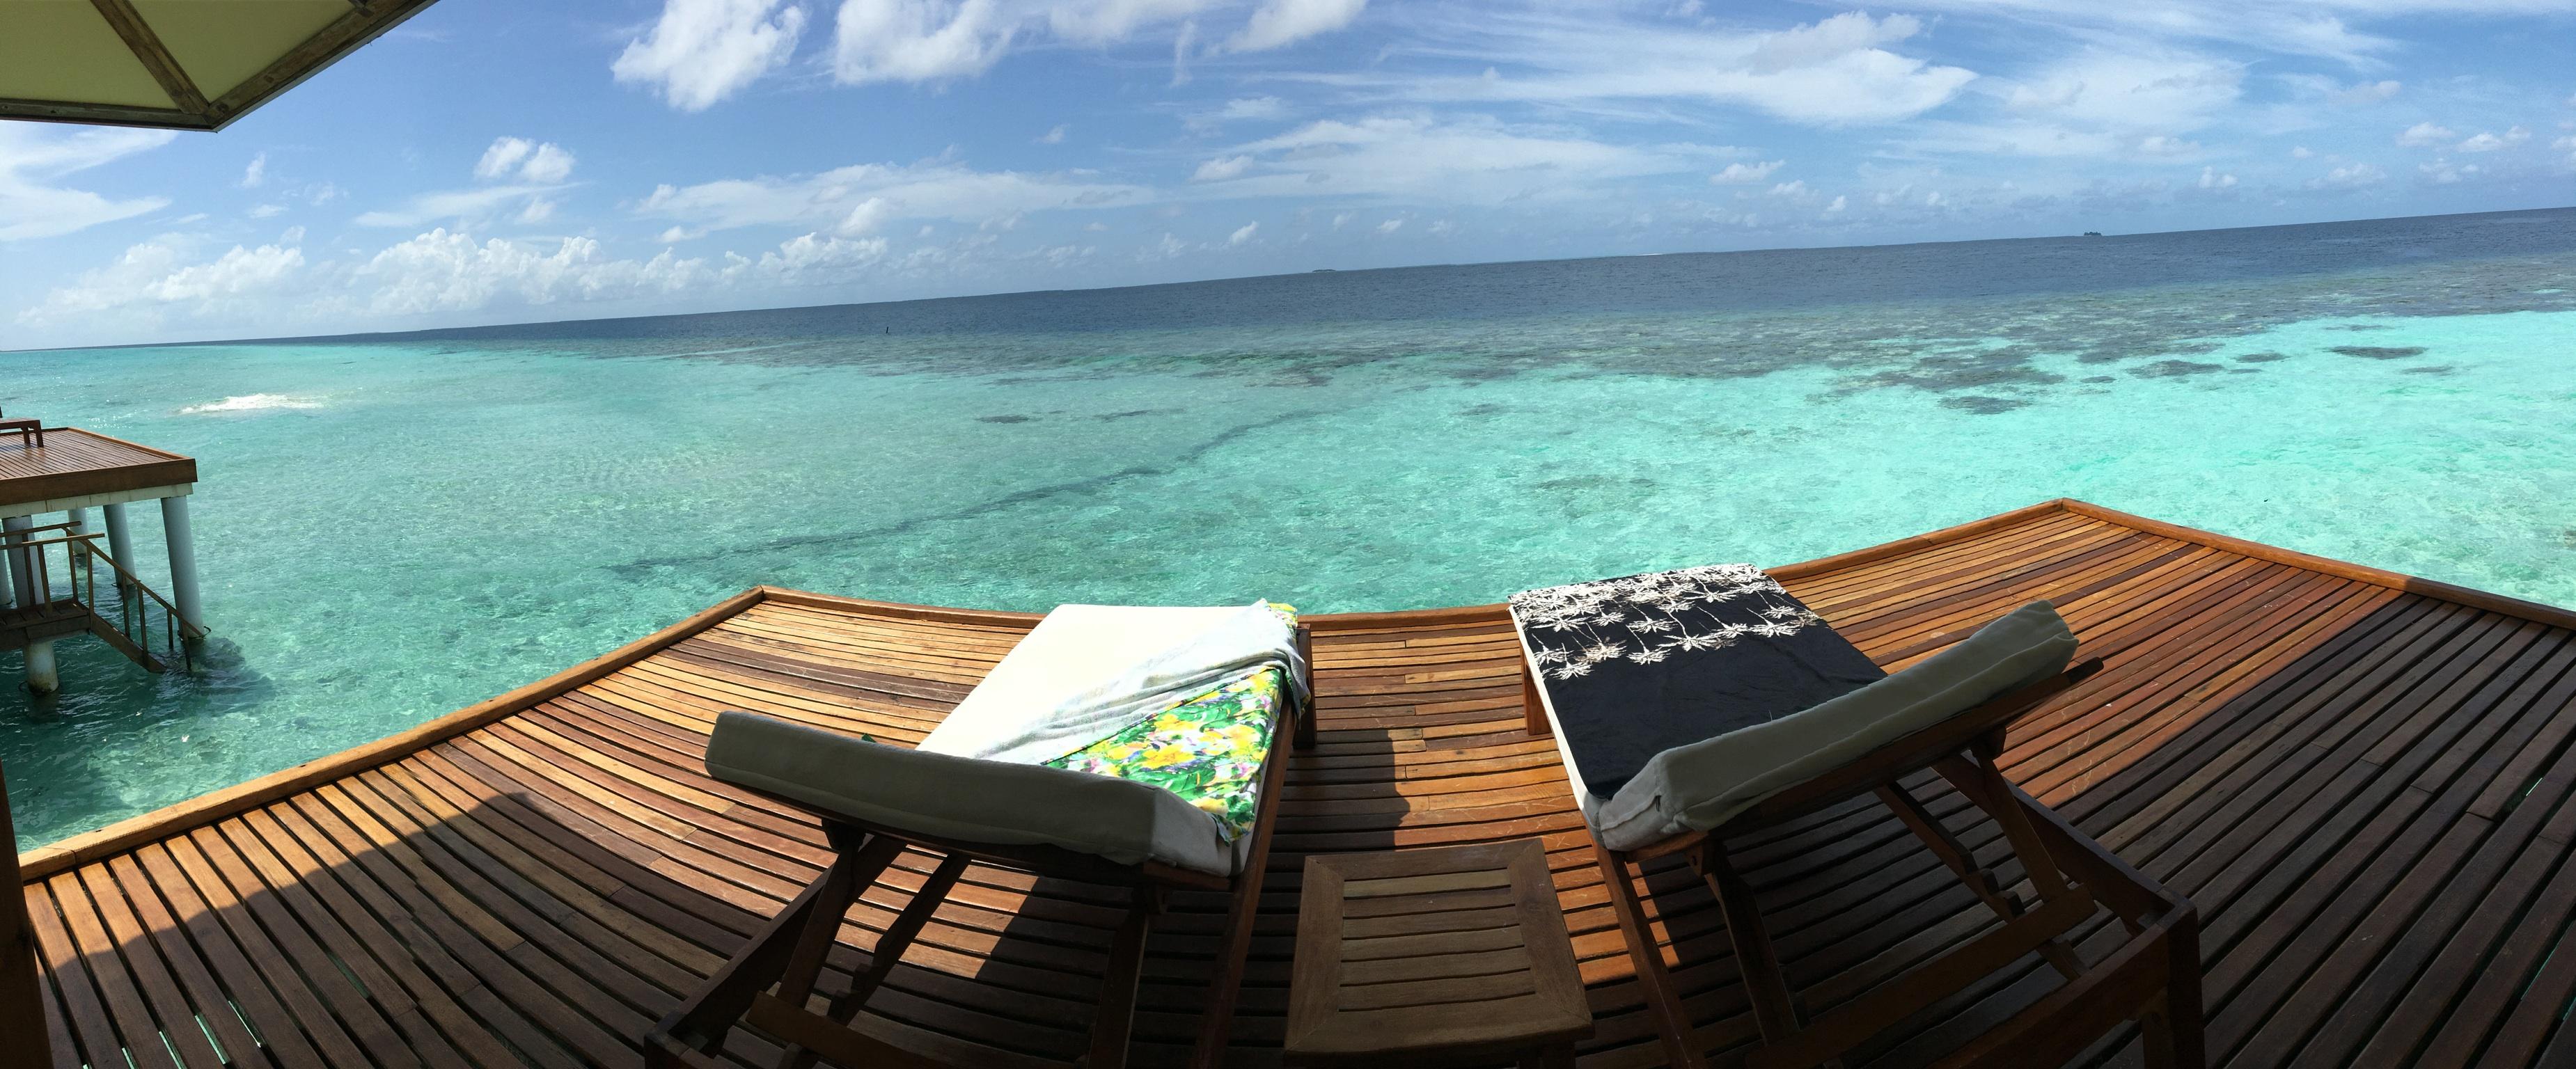 Vacanza seaclub maayafushi - Bagno davide gatteo mare ...